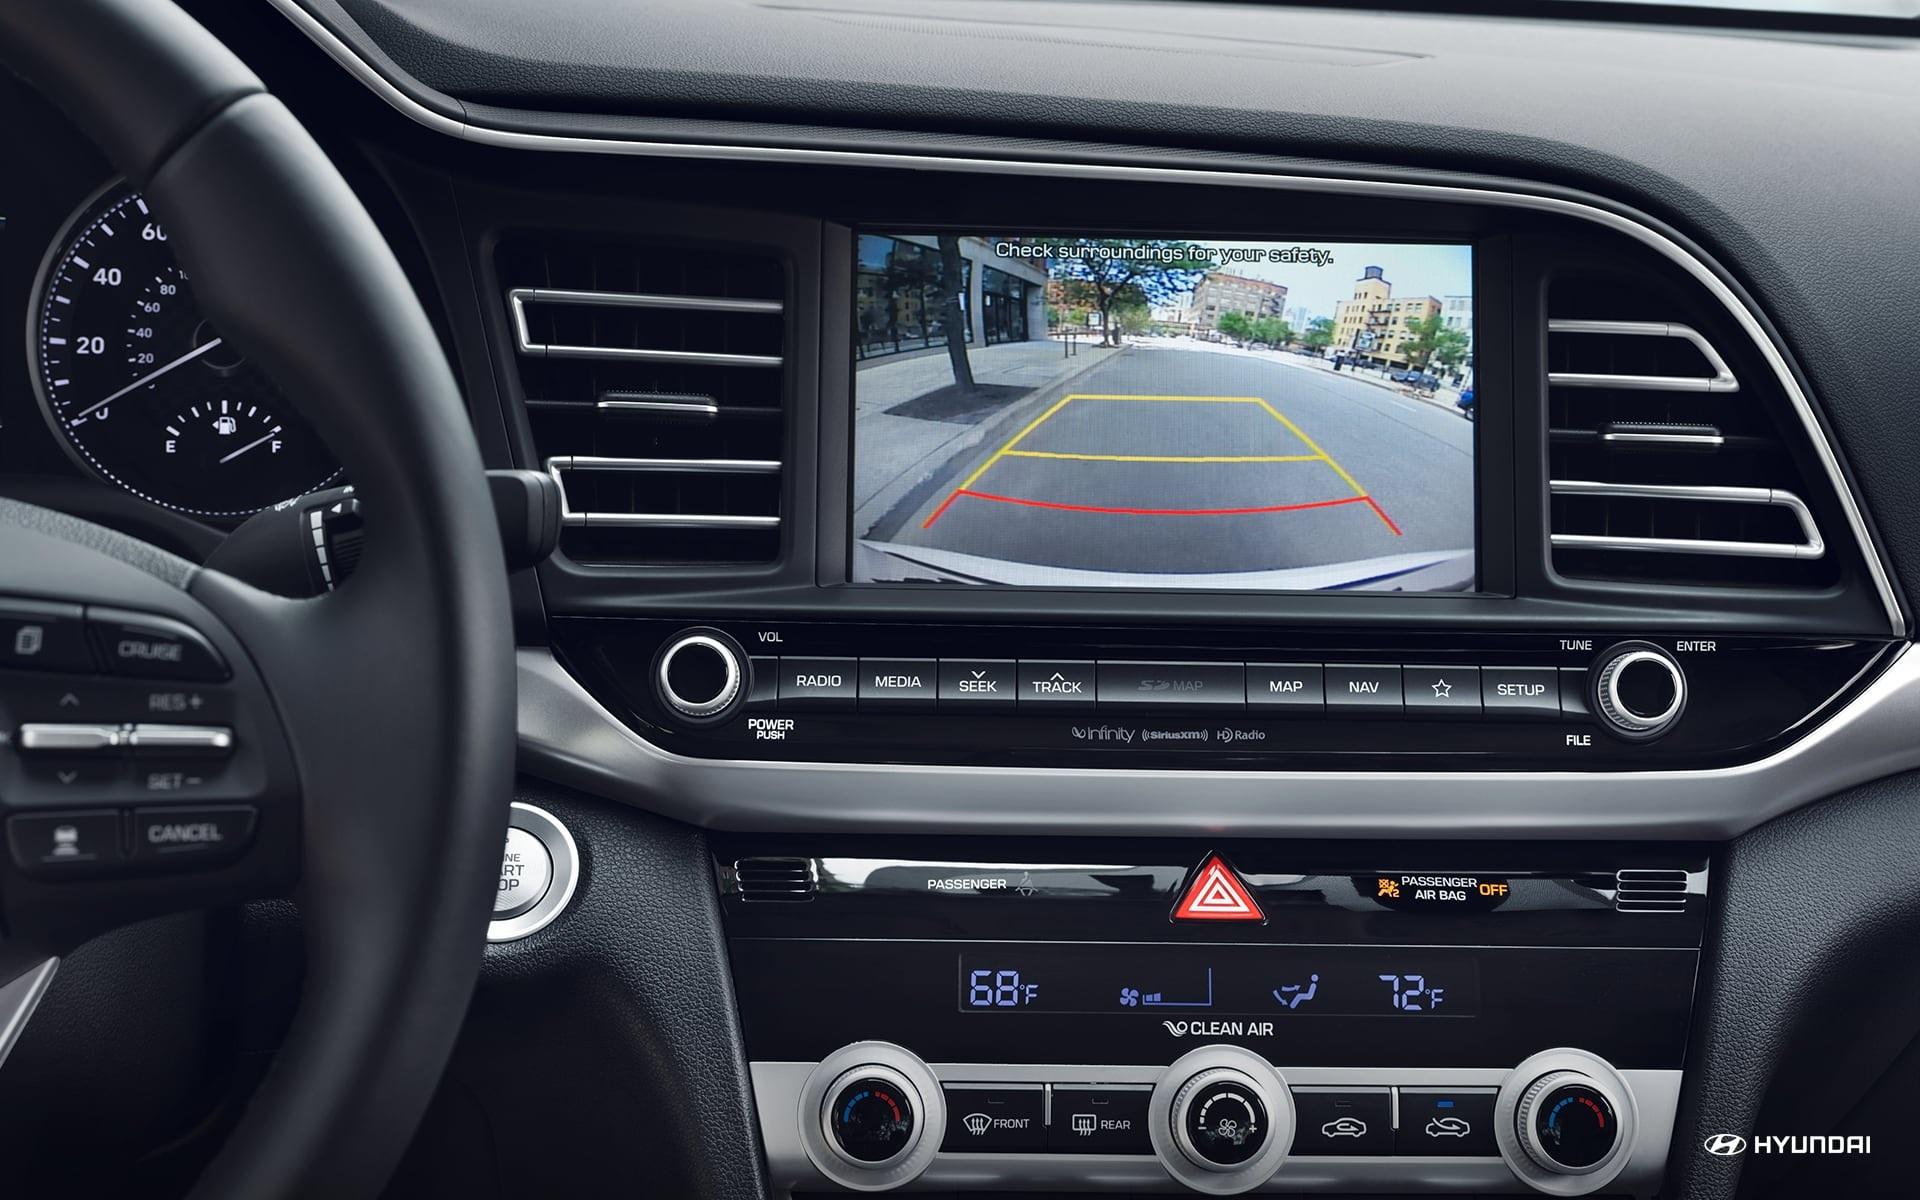 Cámara retrovisora del Hyundai Elantra 2019